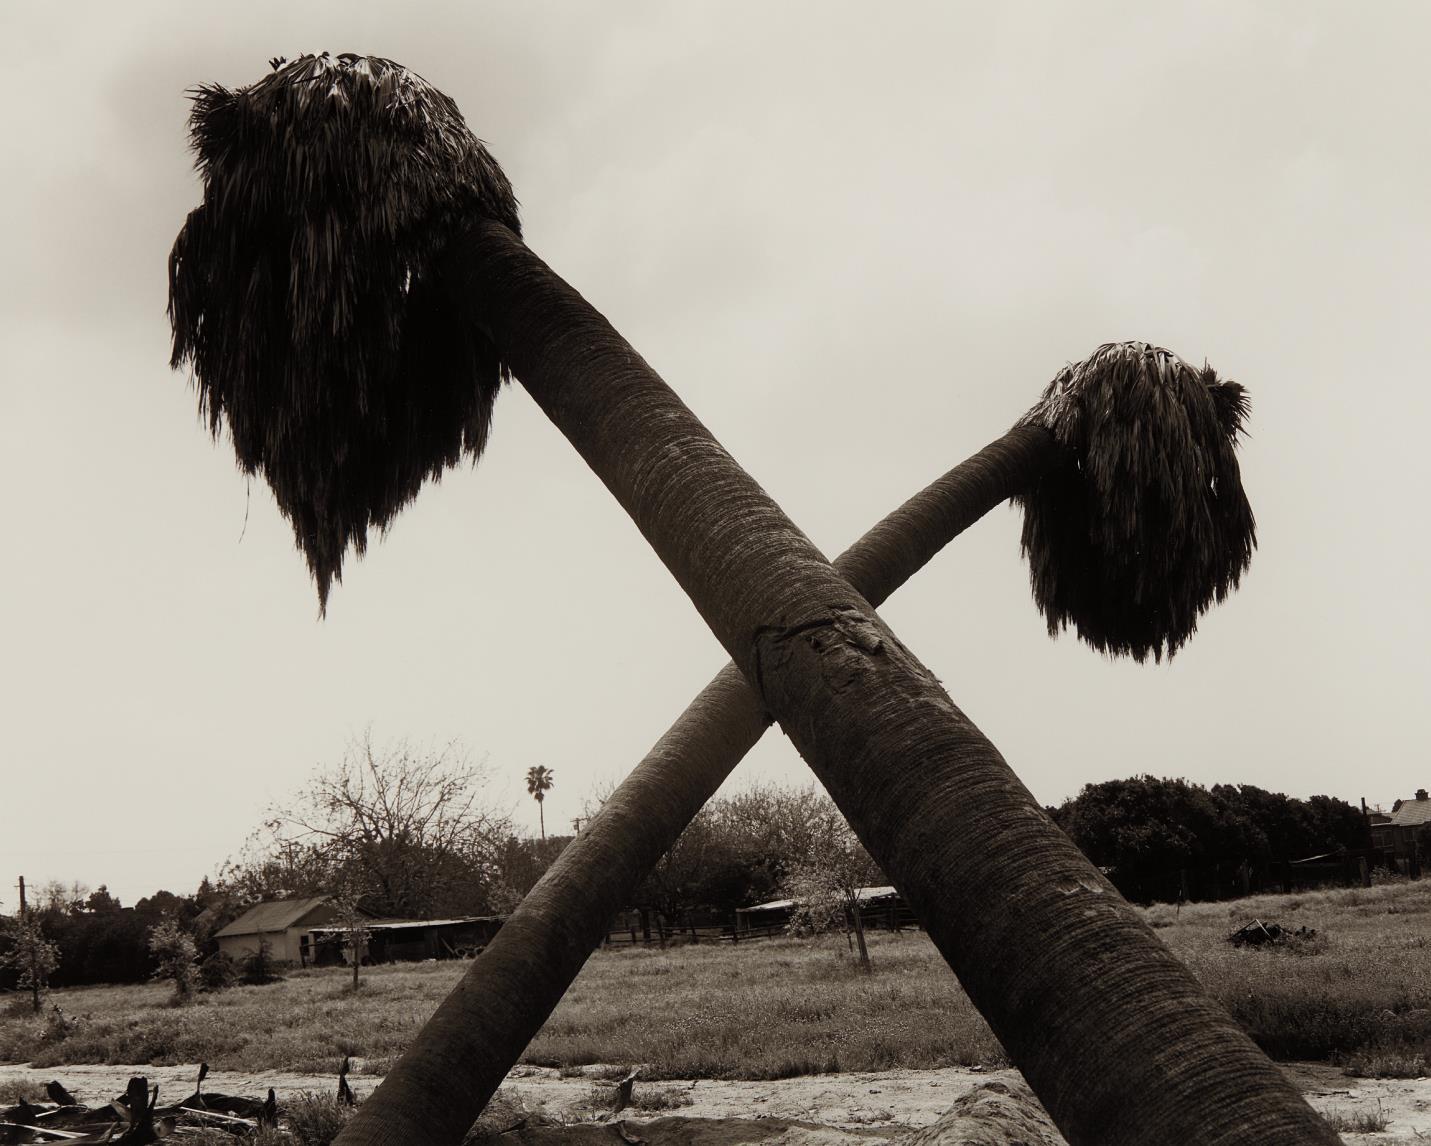 Robert Adams-Dead Palms, Partially Uprooted, Ontario, California-1983